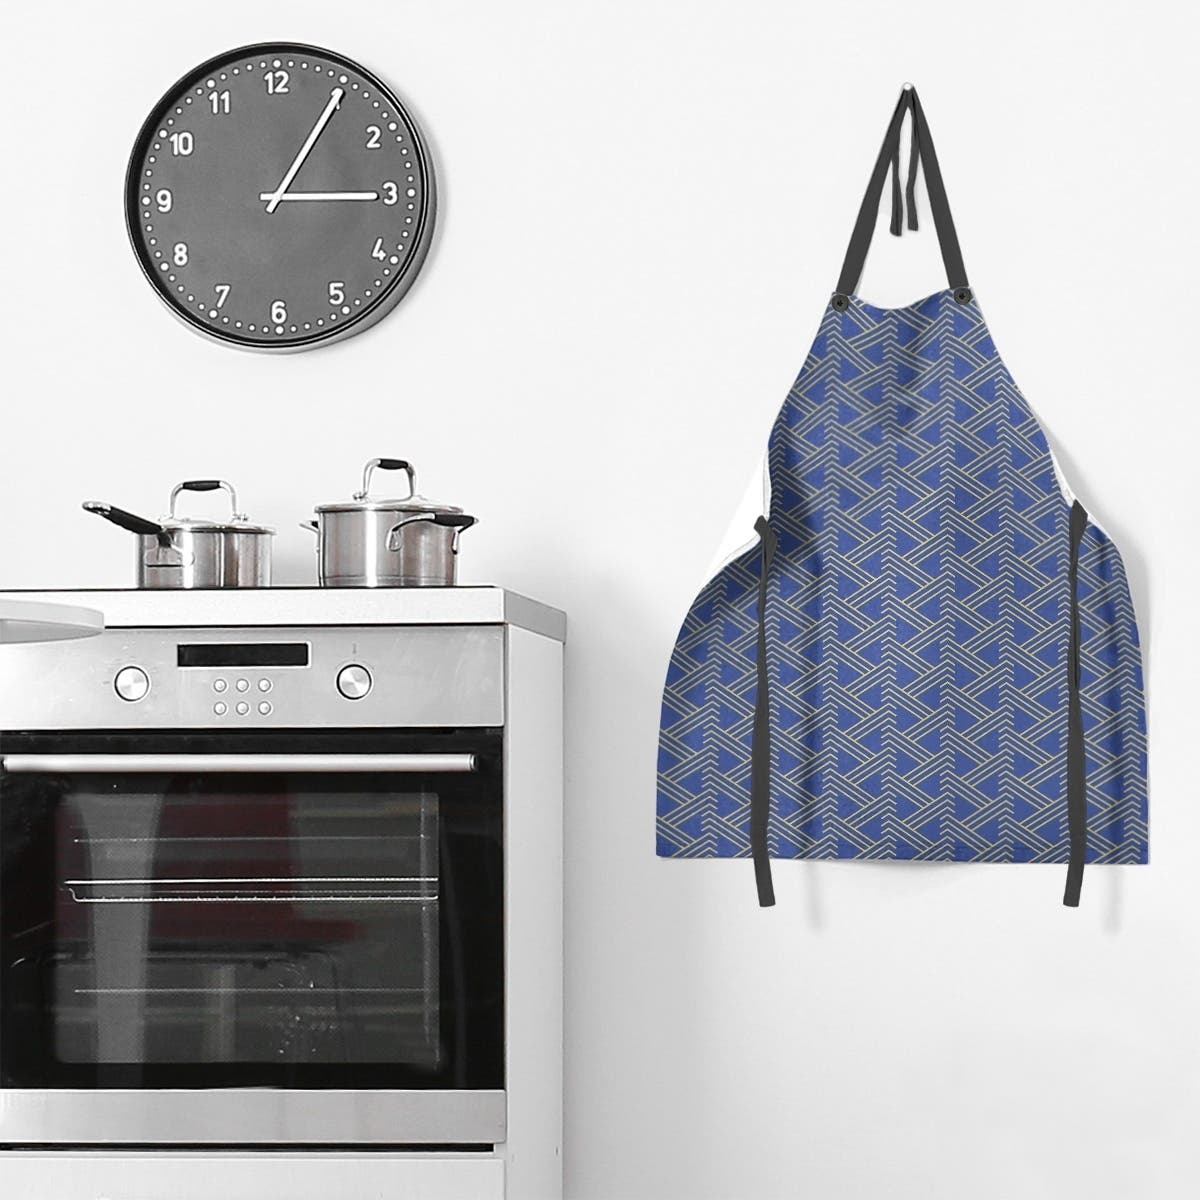 Zig Zag Kitchen: Buy Kitchen Aprons Online At Overstock